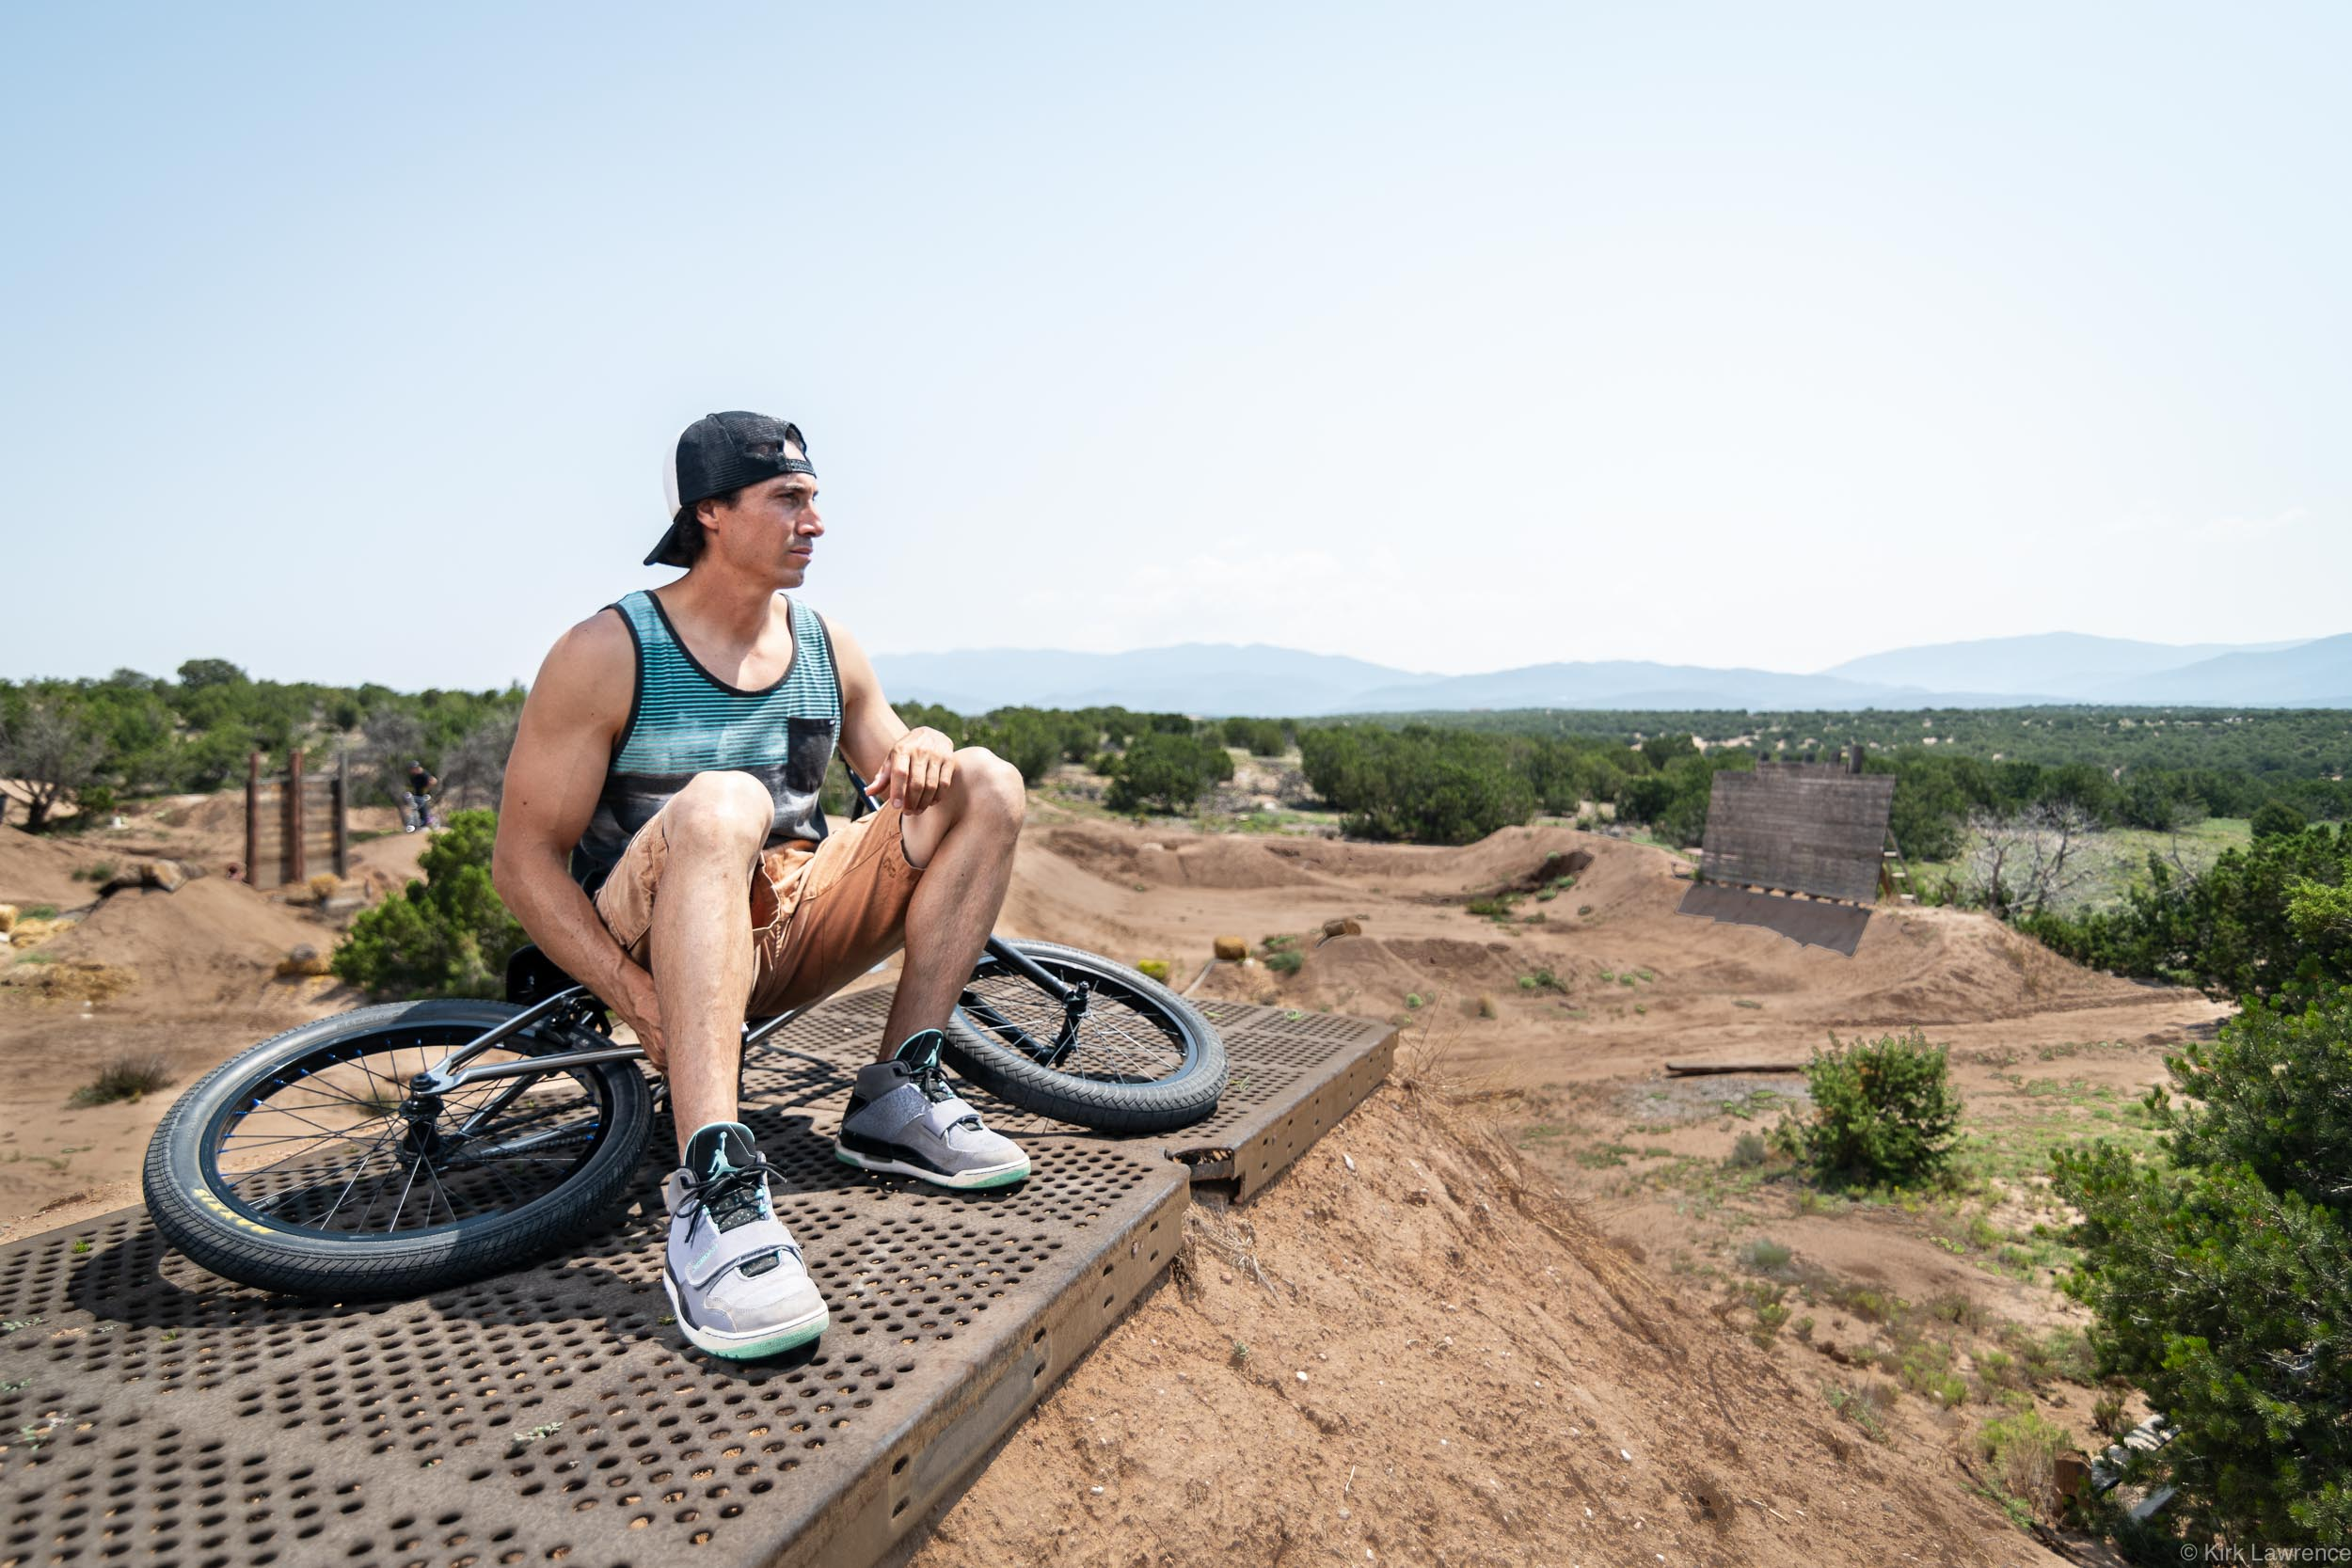 Santa_Fe_New_Mexico_BMX_rider_portrait.jpg